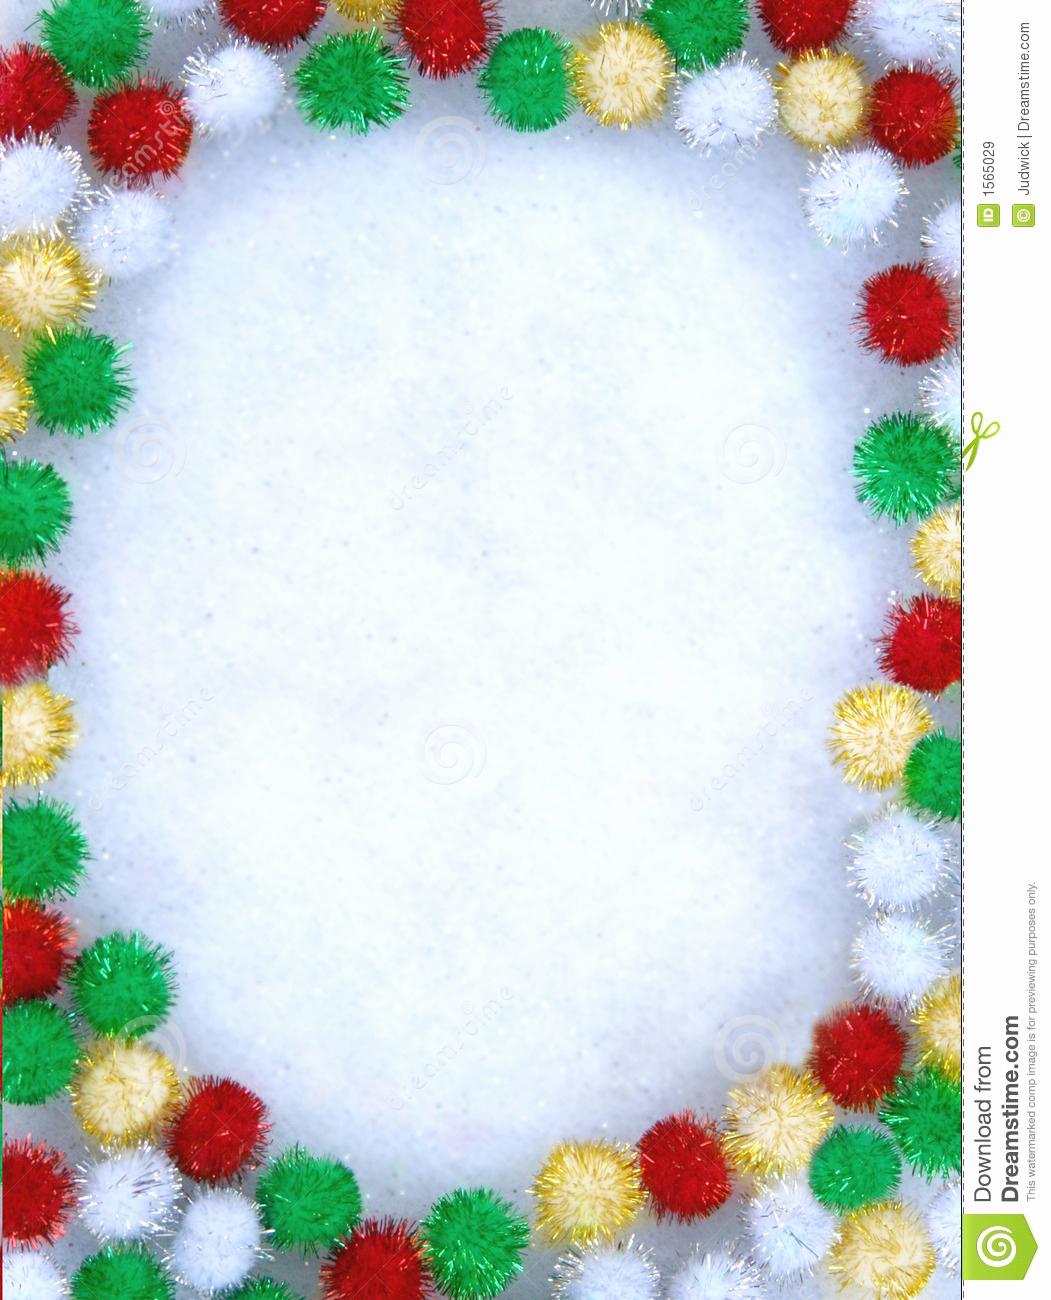 Christmas Letterhead Stationery Free 6 Best Images Of Free Printable - Free Printable Christmas Backgrounds